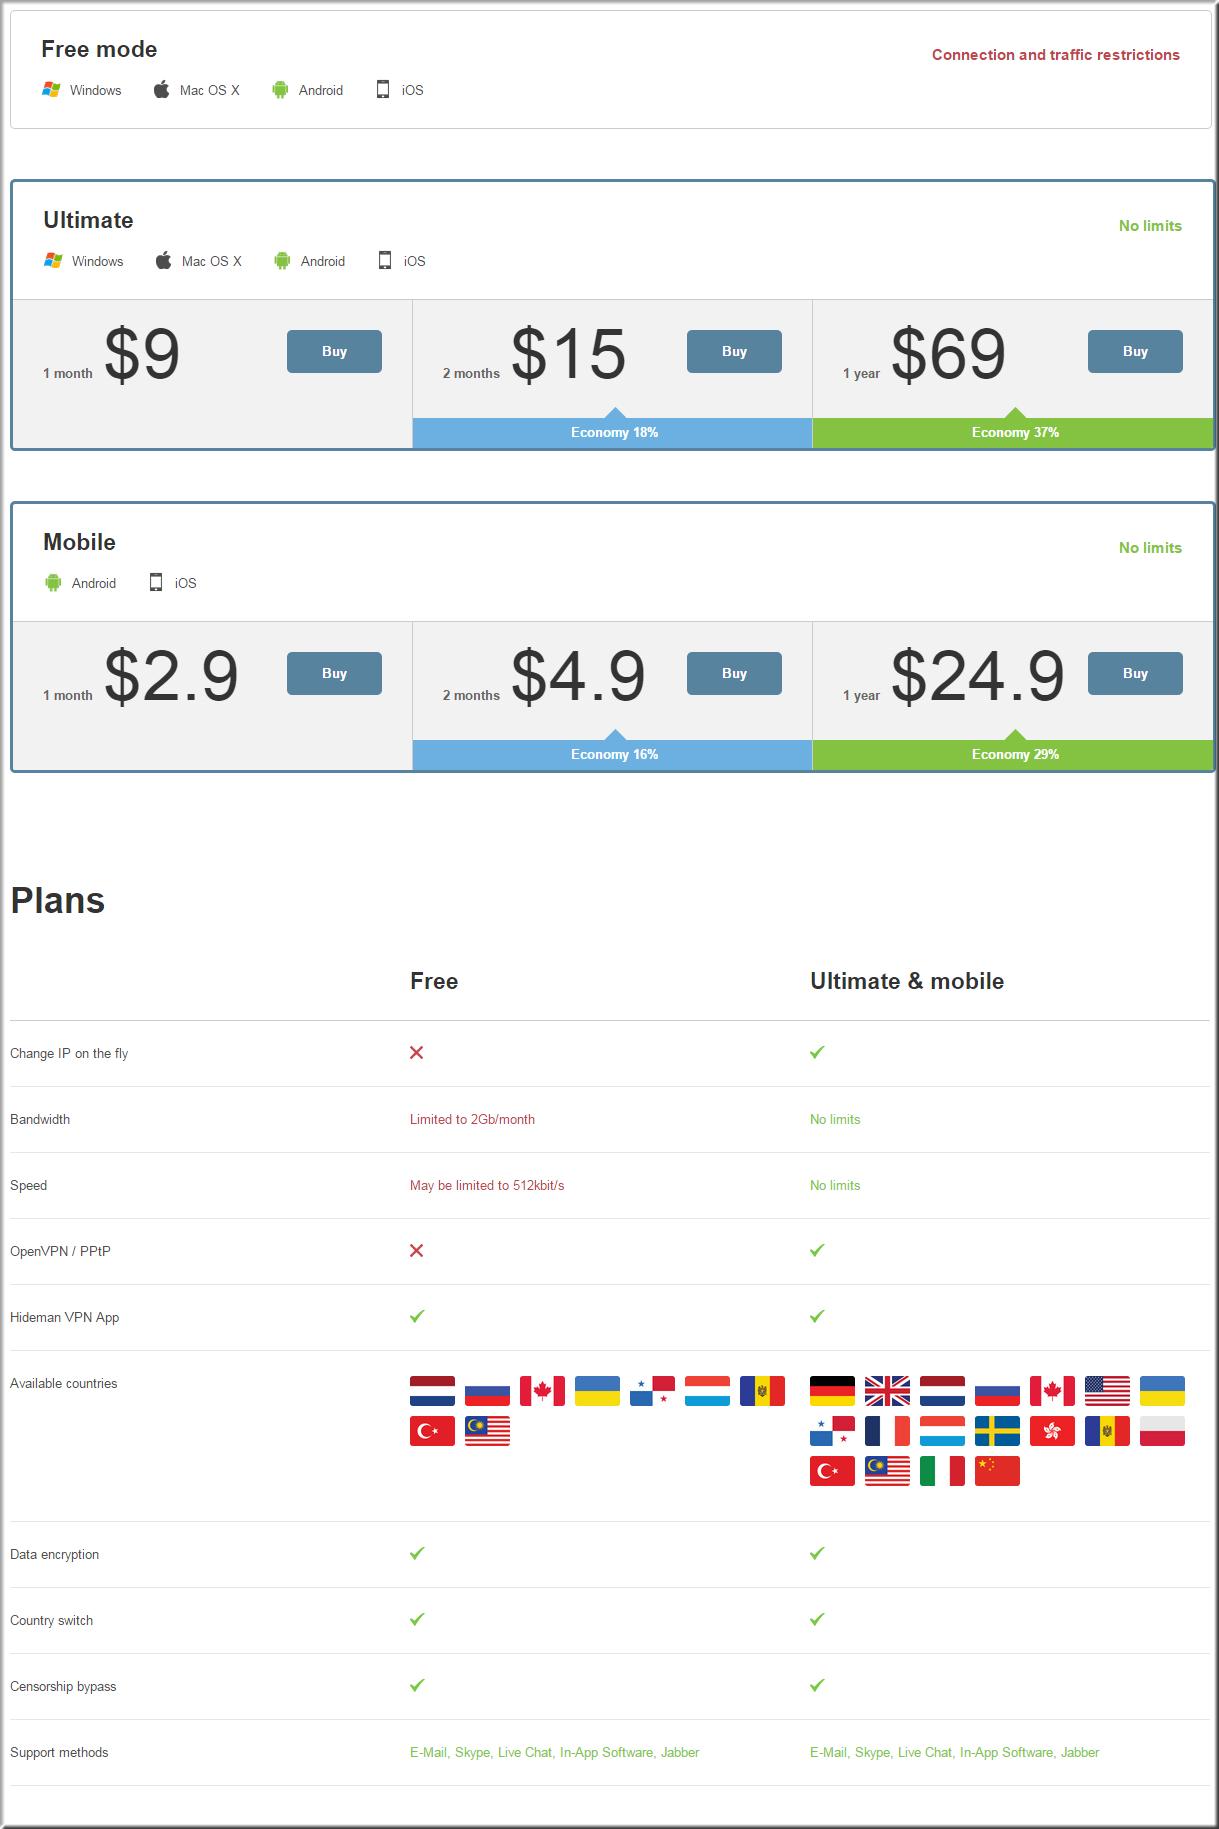 hideman.net pricing plan 2015